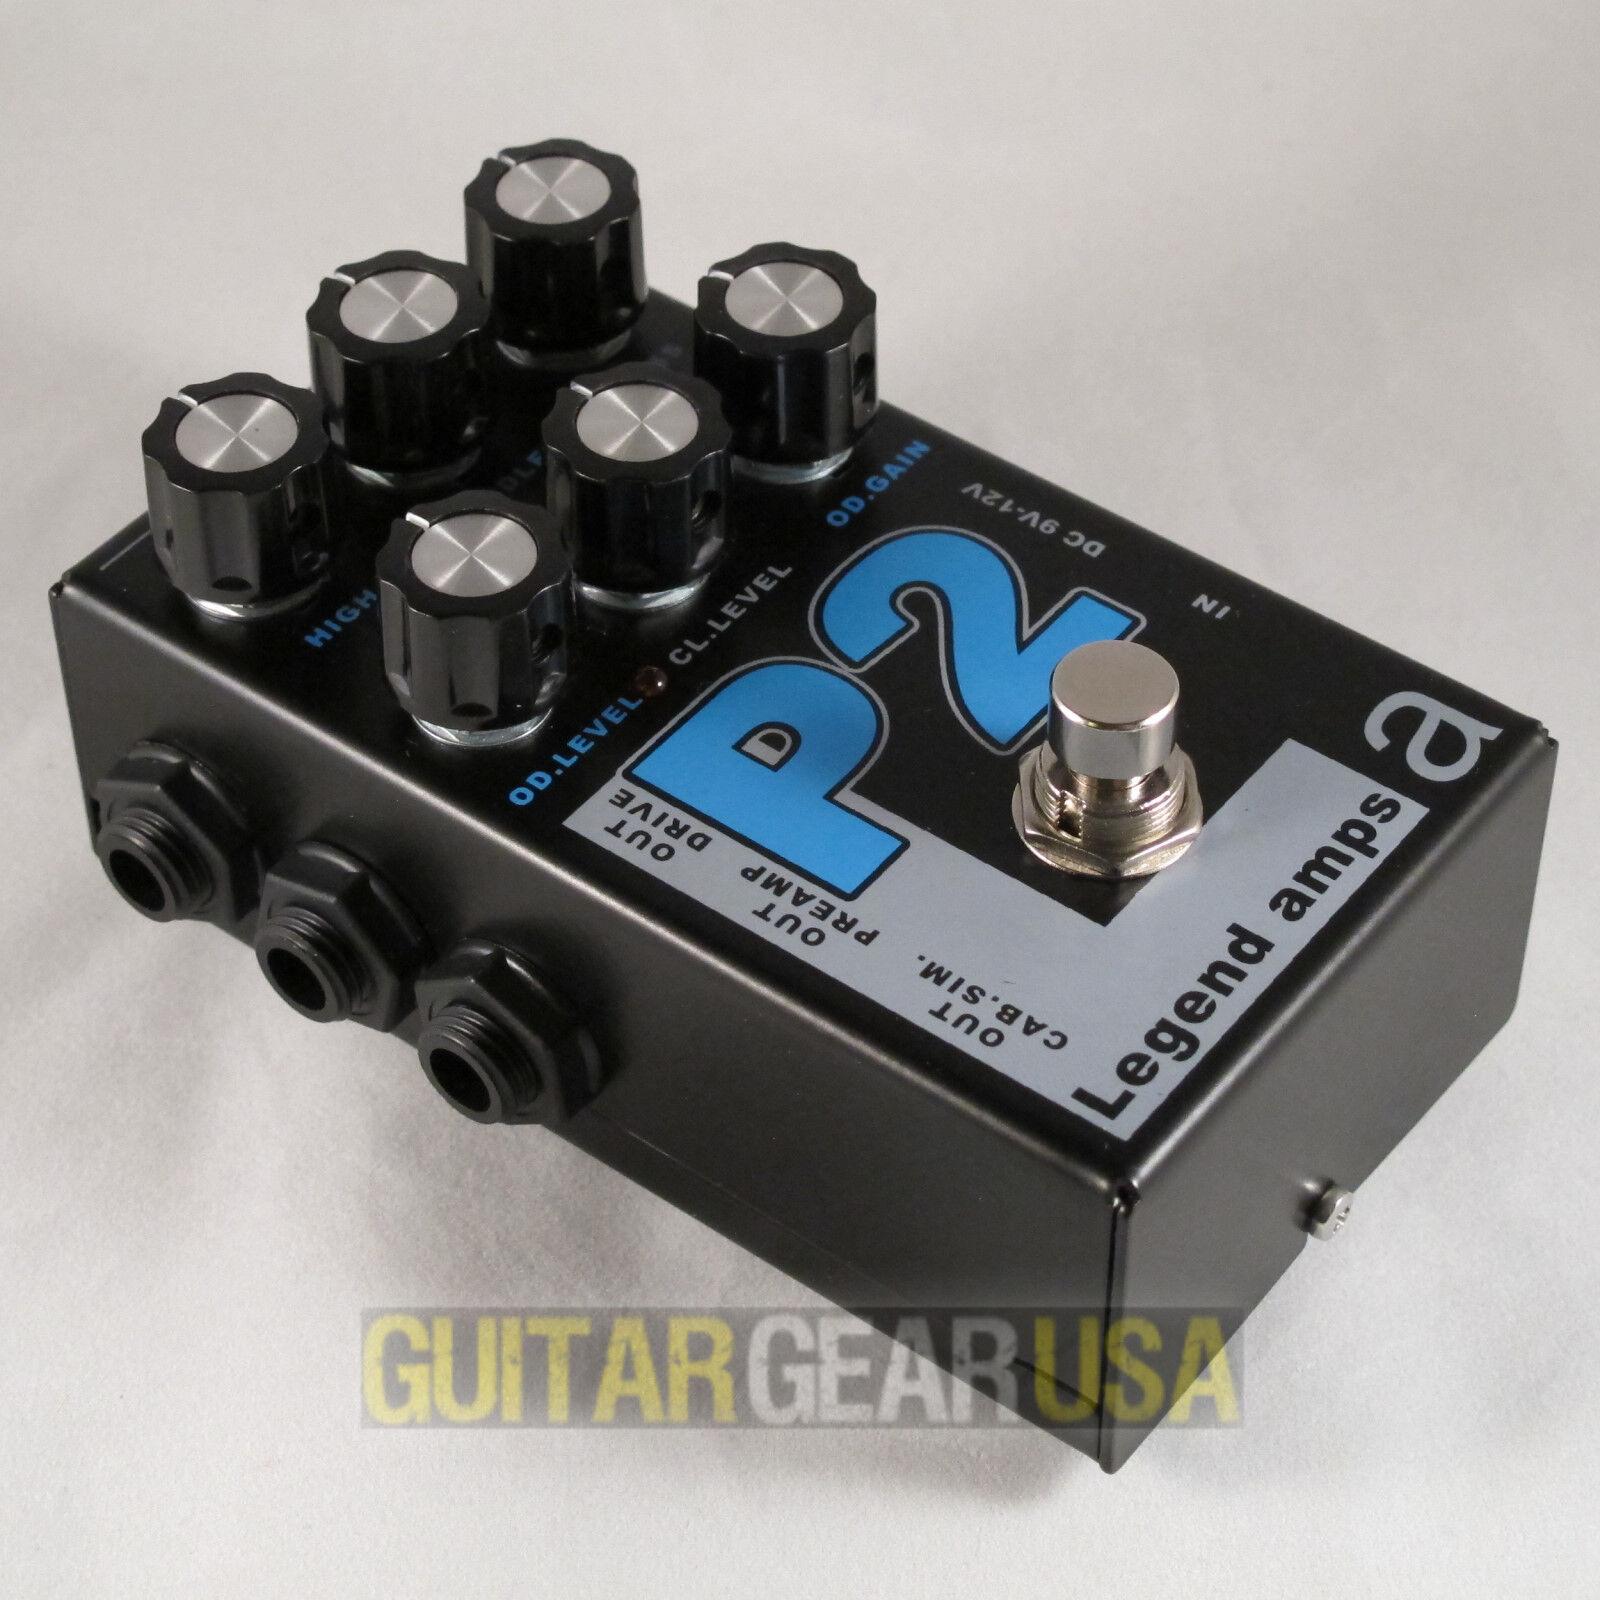 AMT Electronics Guitar Preamp P-2 (Legend Amp Series 2) emulates Peavey 5150